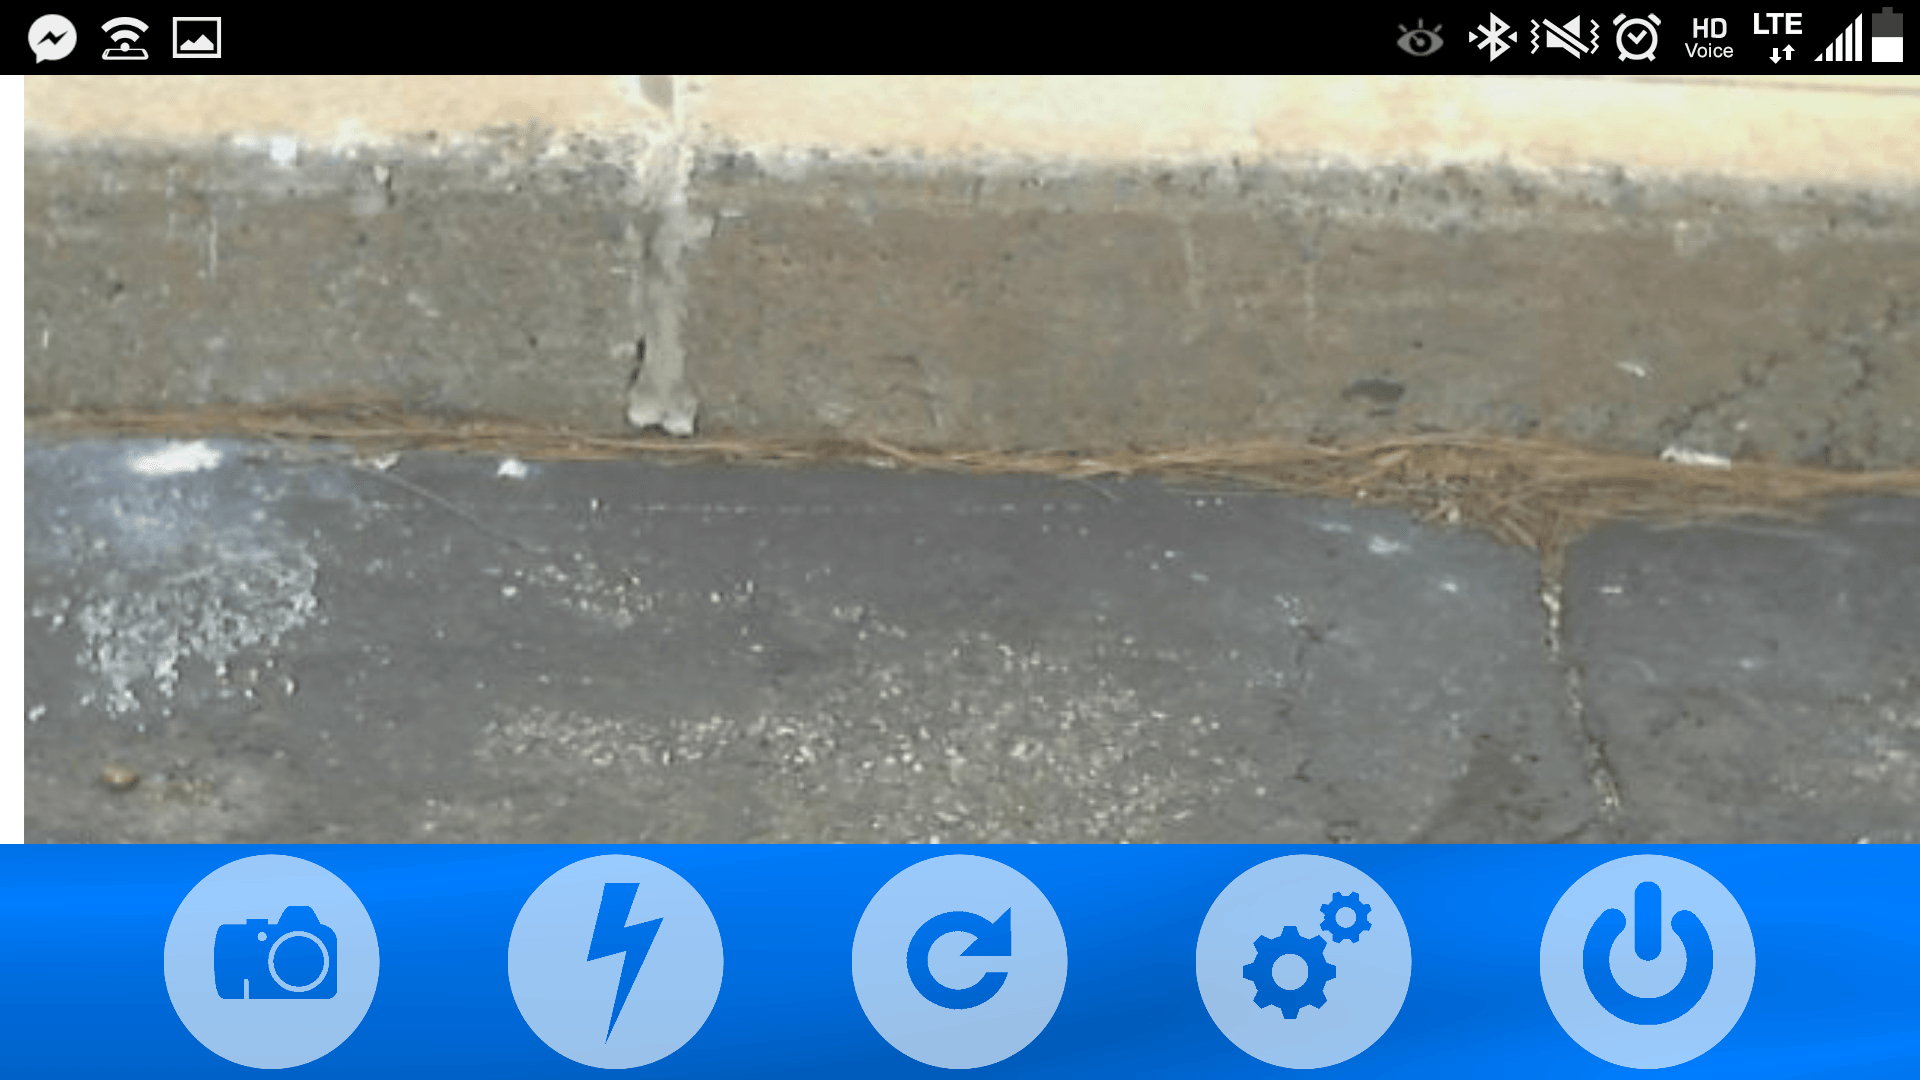 Wireless Raspberry Pi Backup Camera + Android App